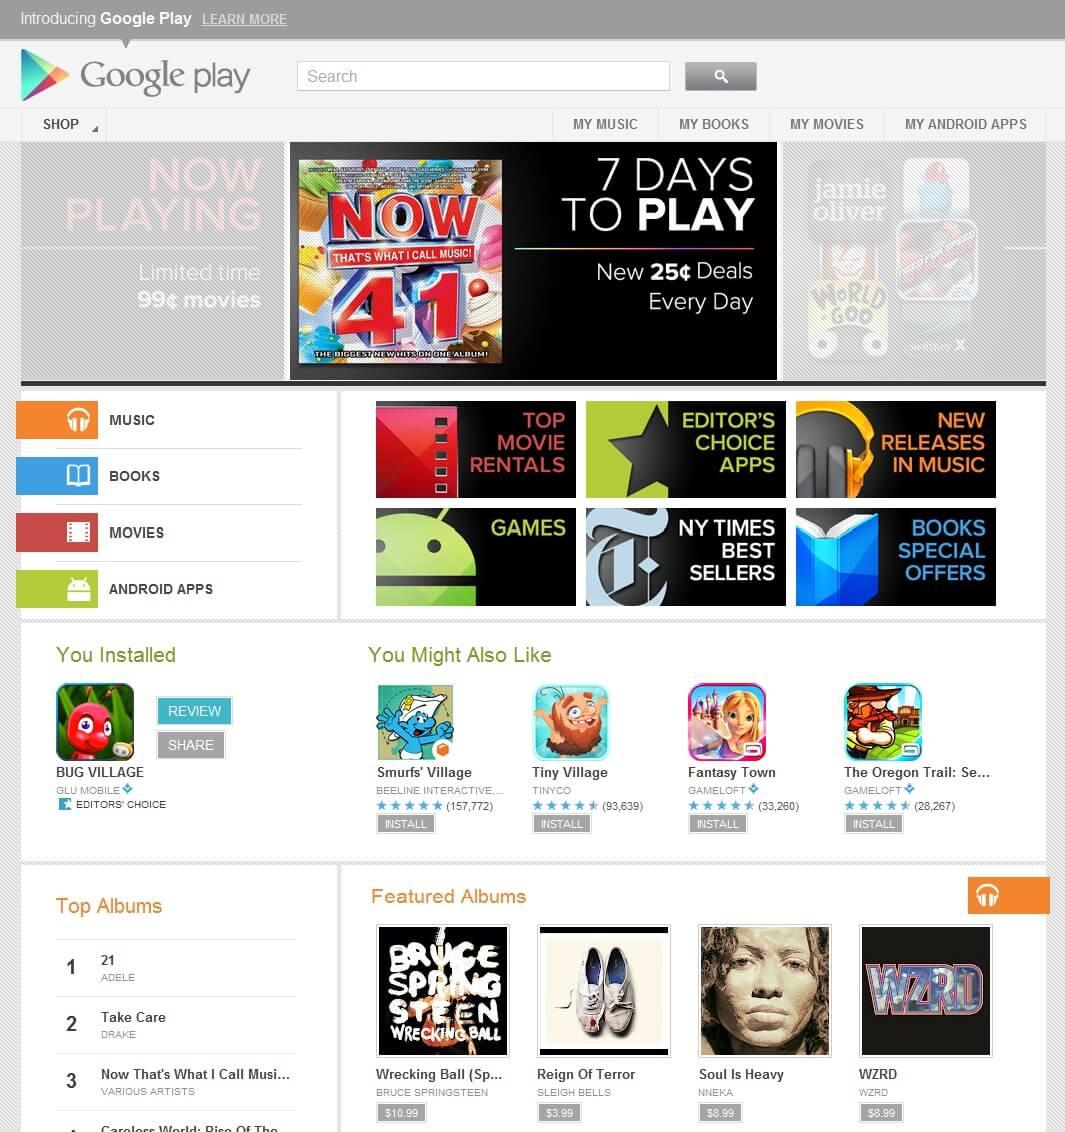 TCL S720 Google Play error